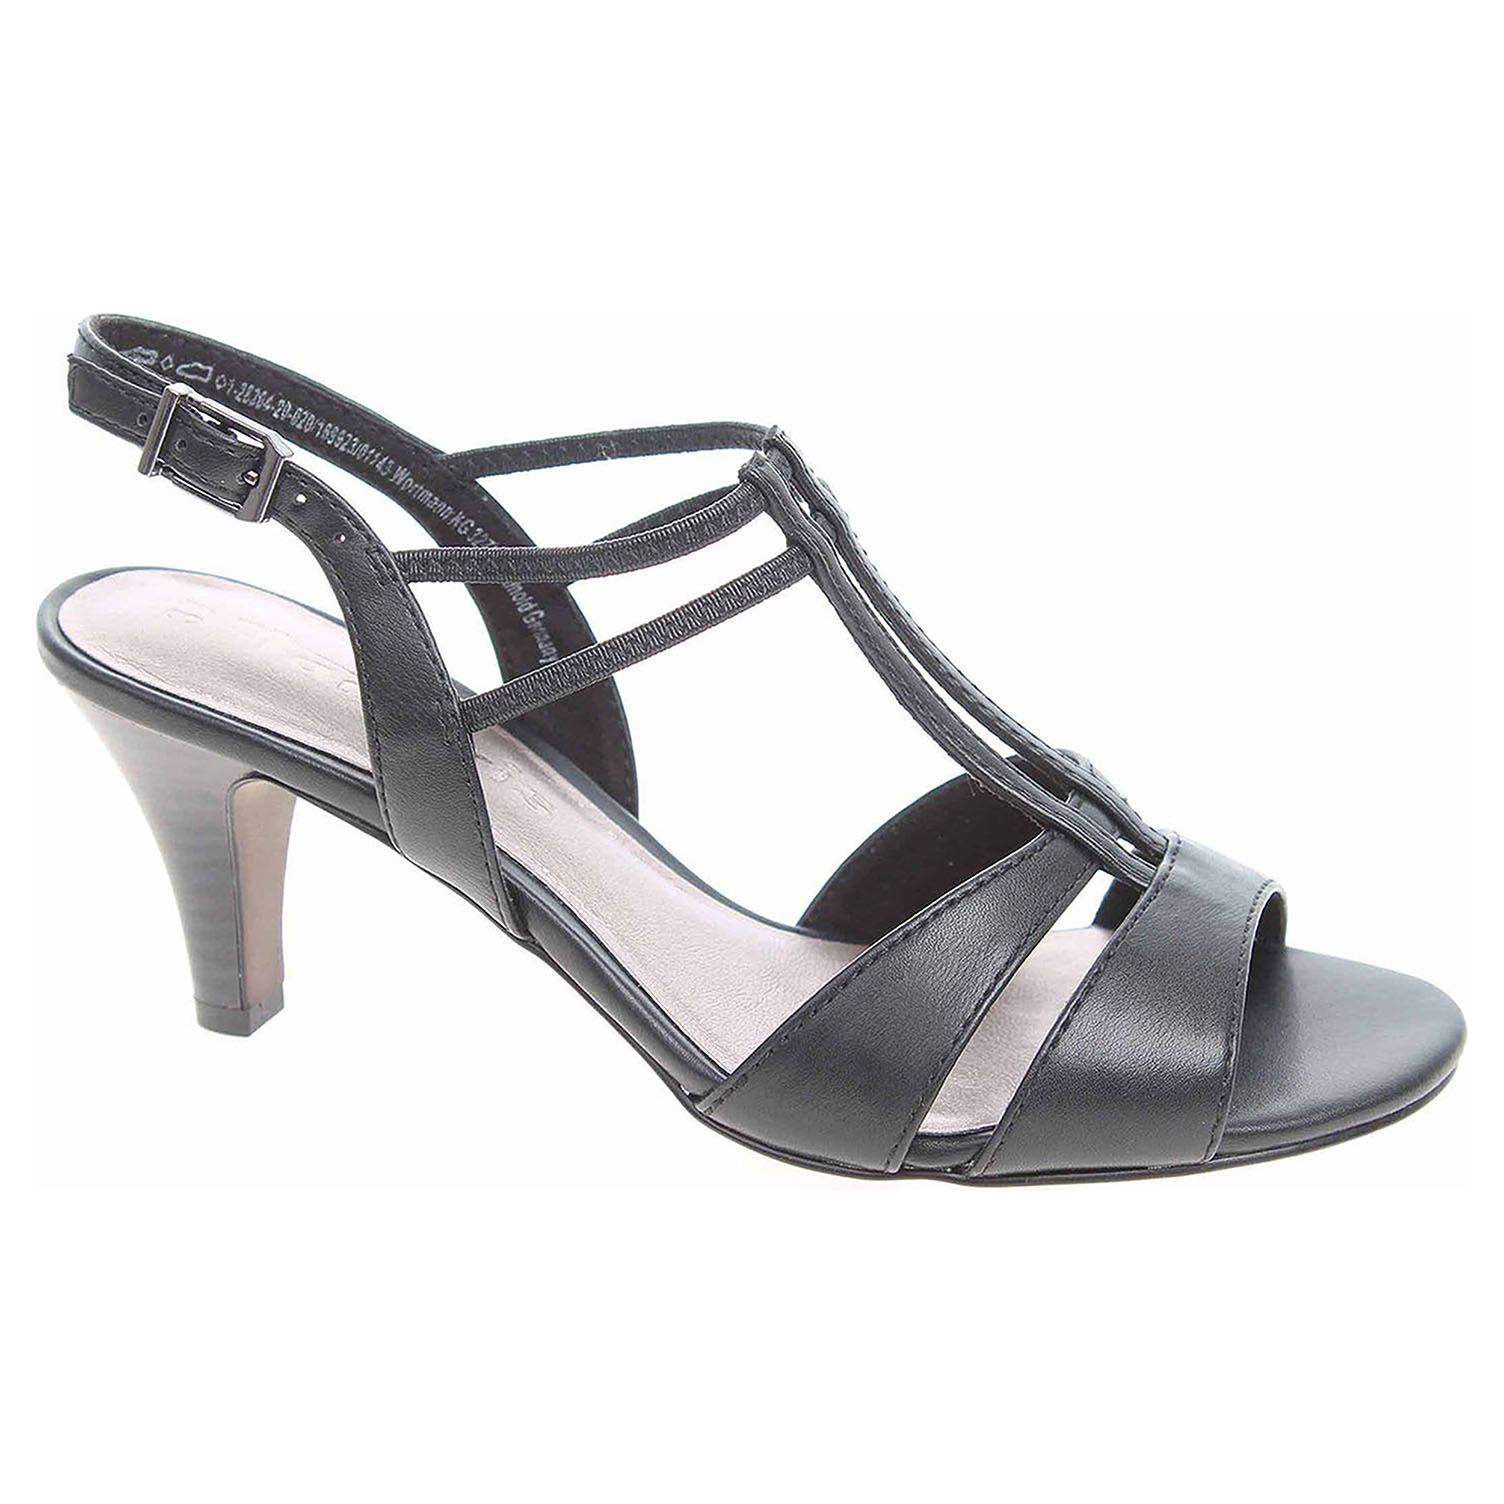 Dámská společenská obuv Tamaris 1-28304-22 black matt 1-1-28304-22 020 39